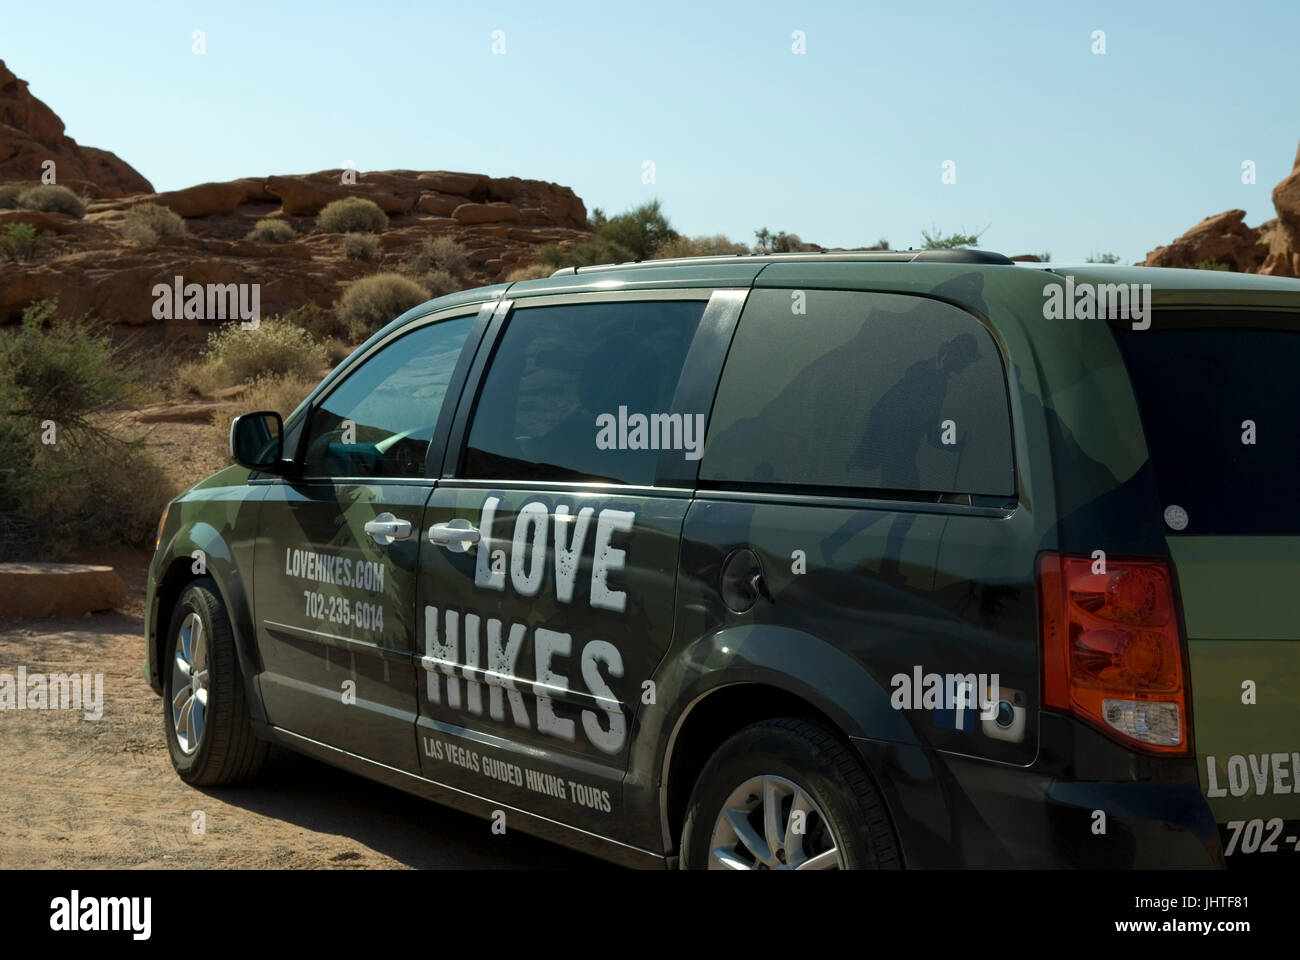 Stock photo of Love Hikes Walking Tour Van near Las Vegas, Nevada, USA. - Stock Image